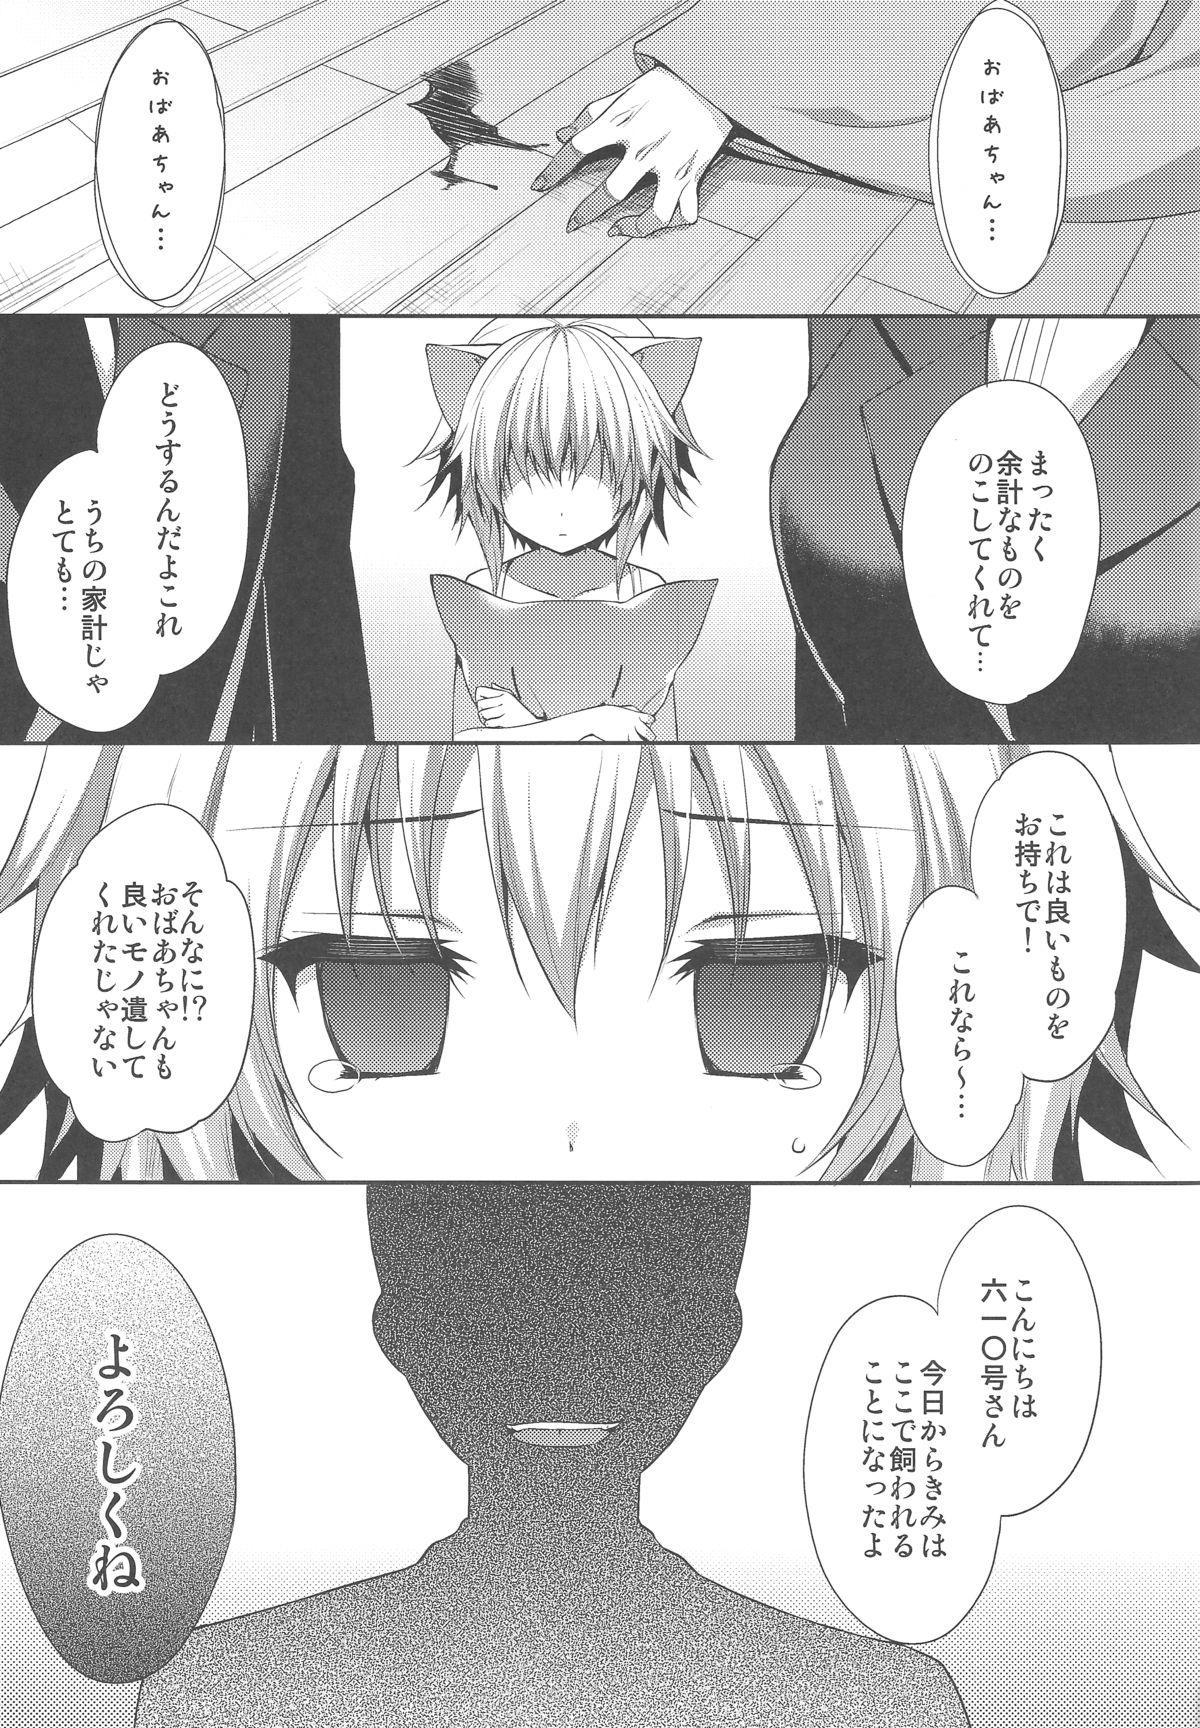 "Bitter na Coffee to Sugar na Milk ""Samishigariya no Koneko"" 3"